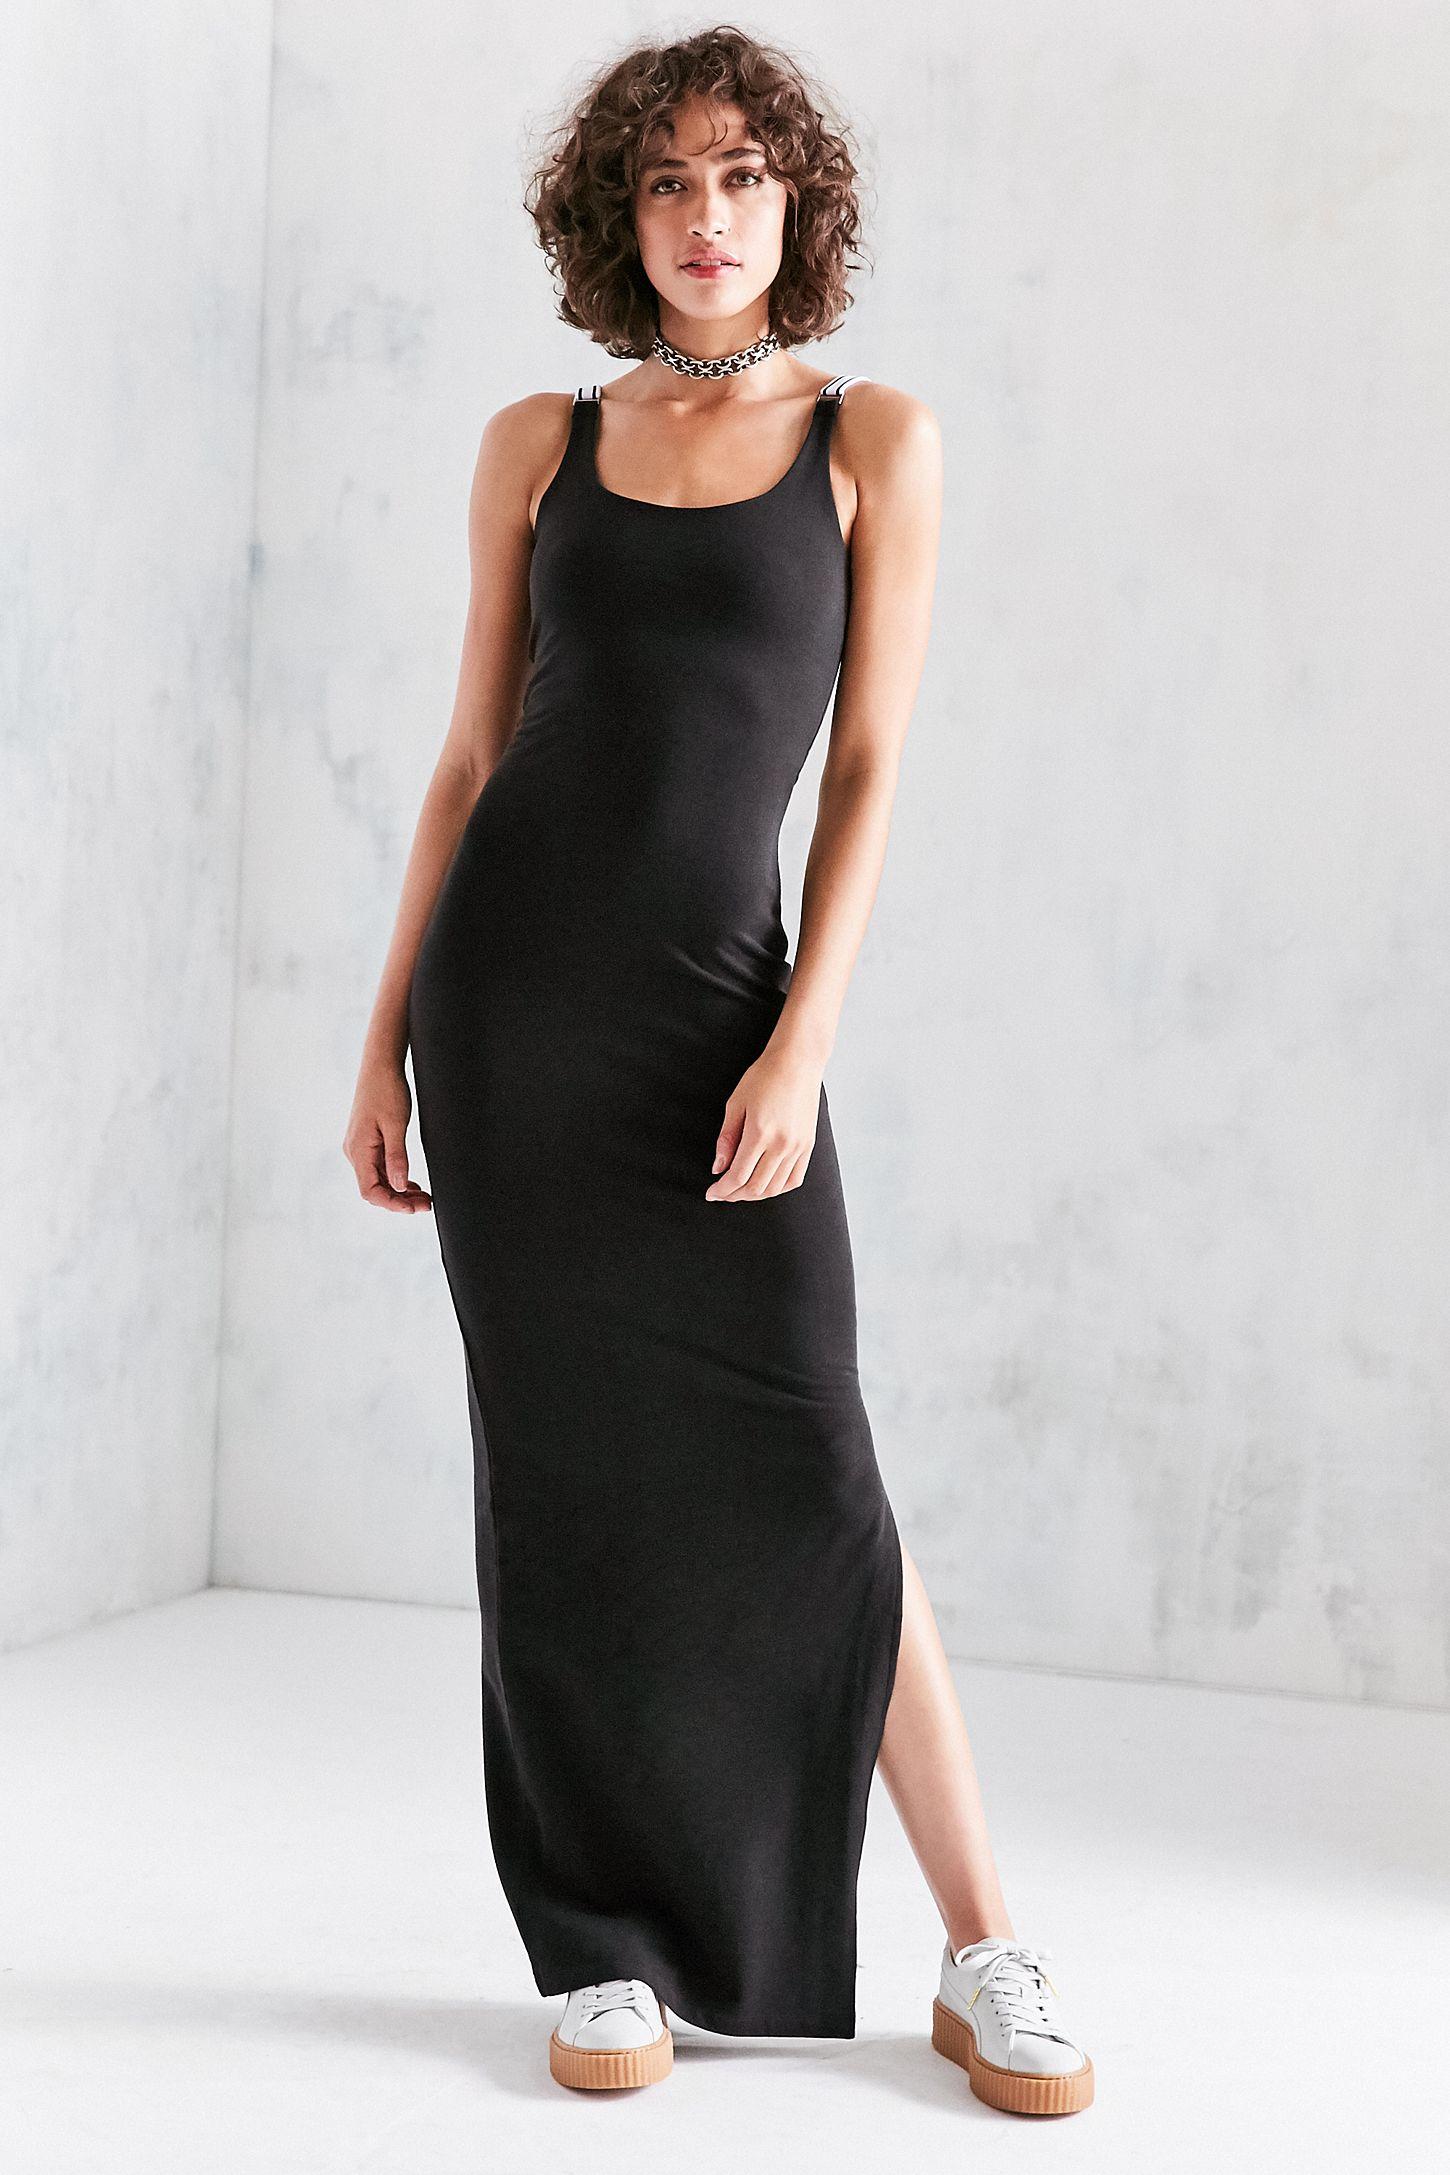 63898e6db0b Puma Fenty By Rihanna Column Maxi Dress